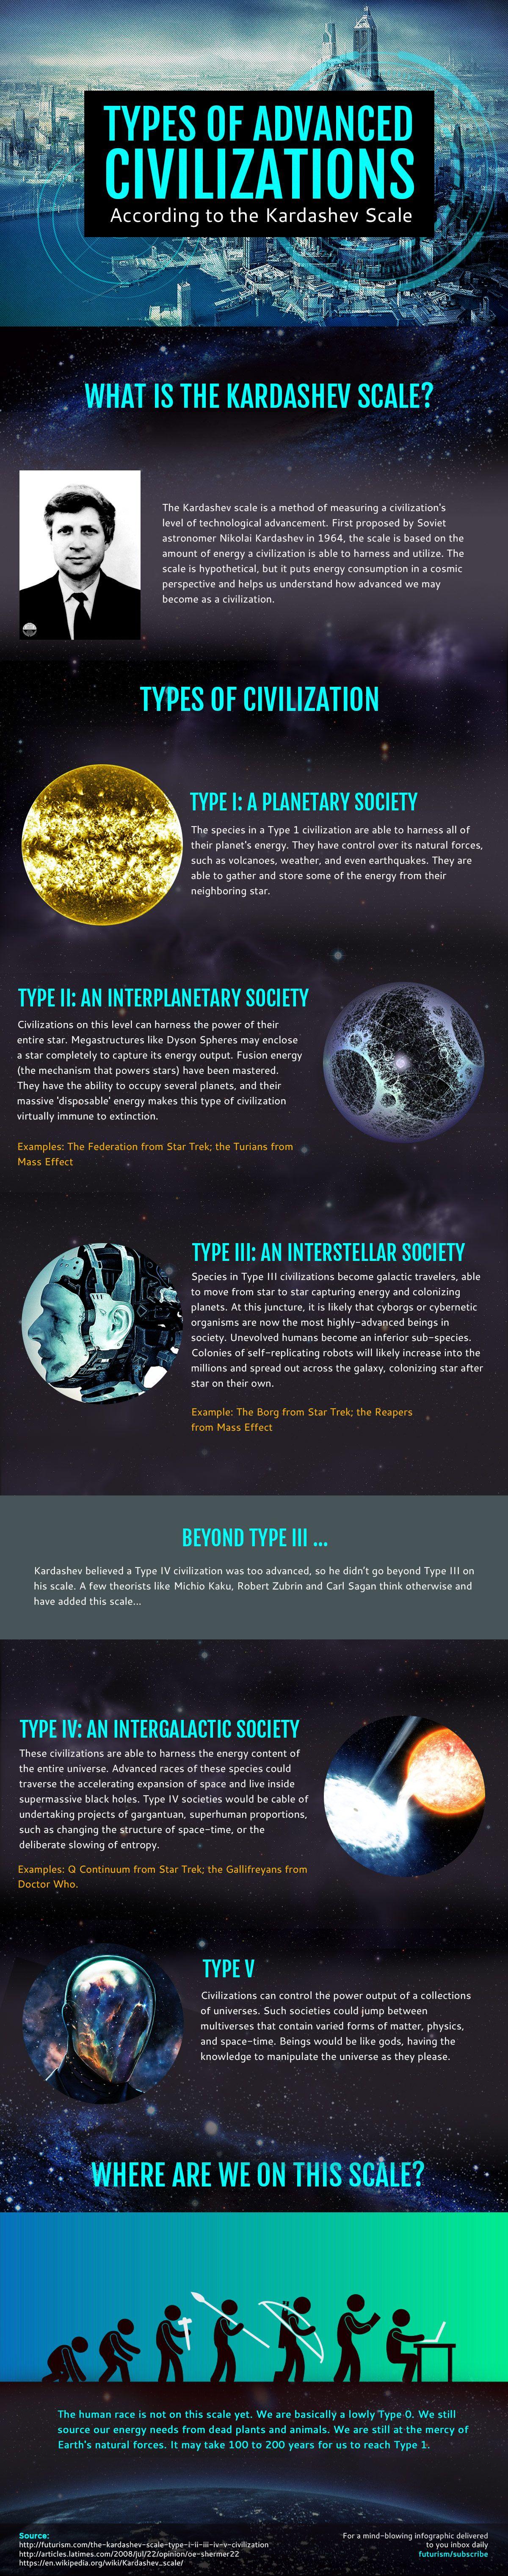 Types of Advanced Civilizations (Futurism)